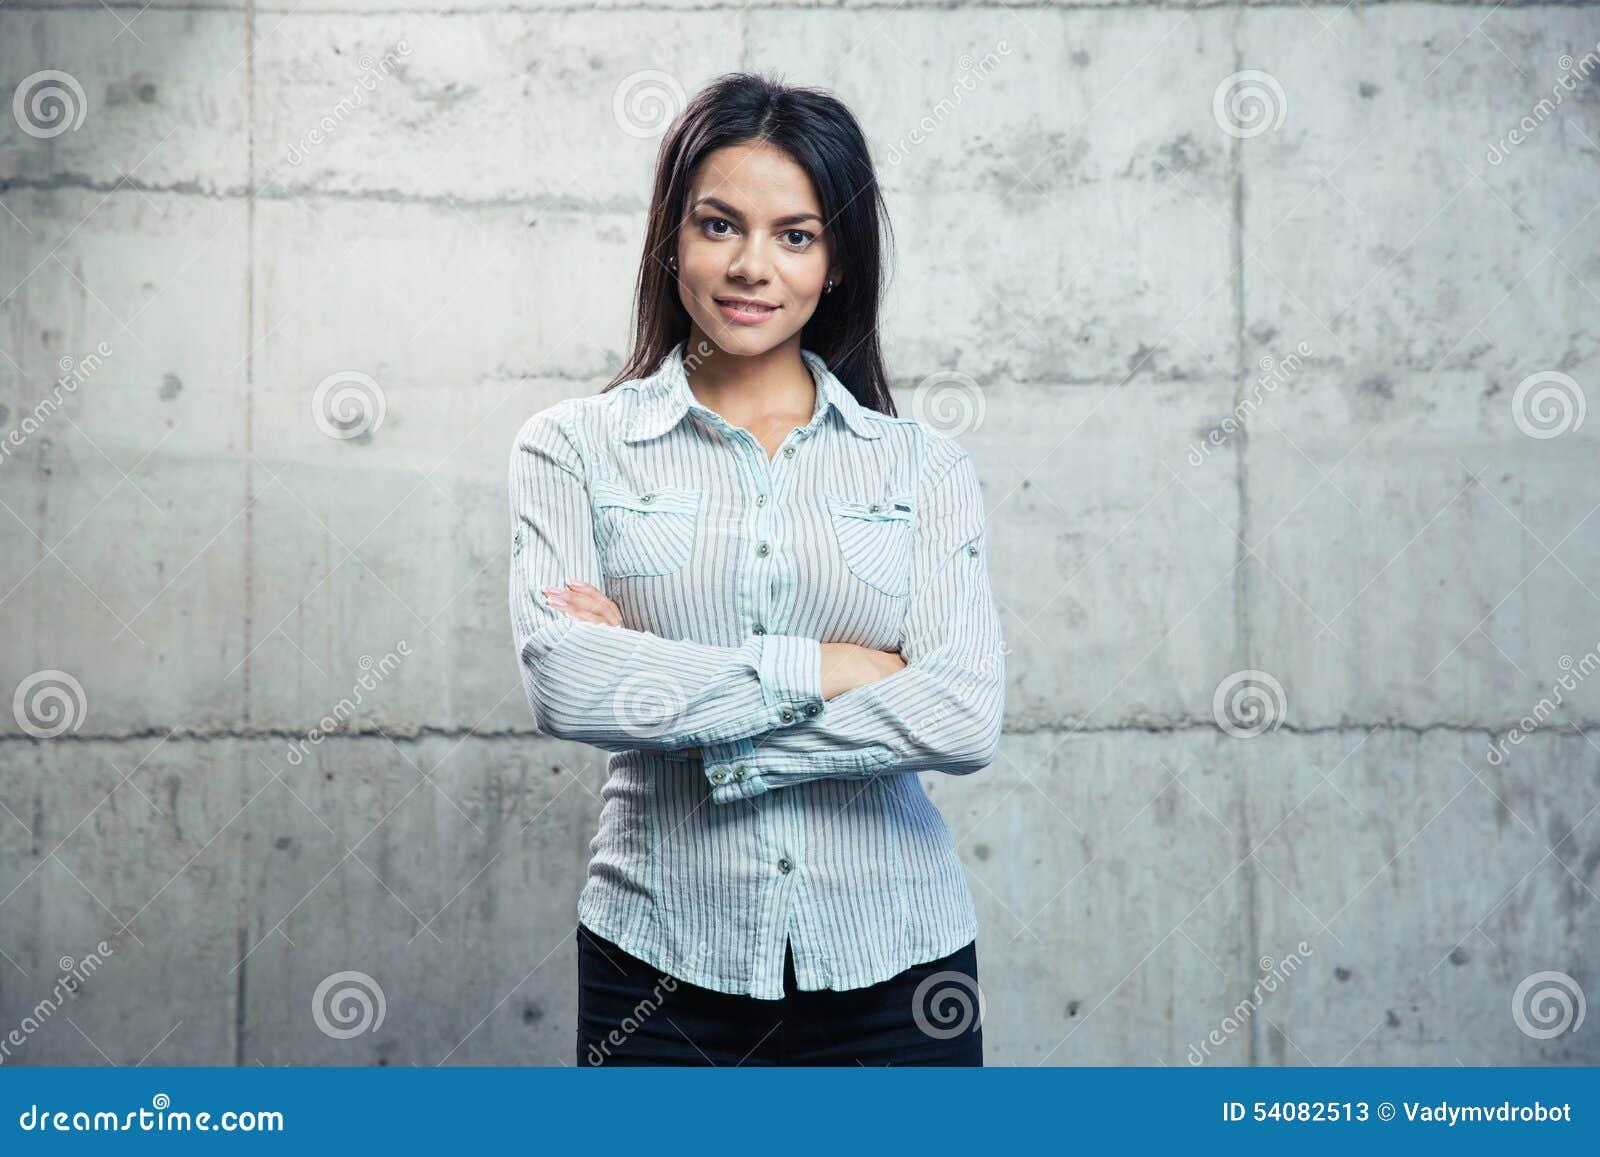 Portret van een glimlachende onderneemster